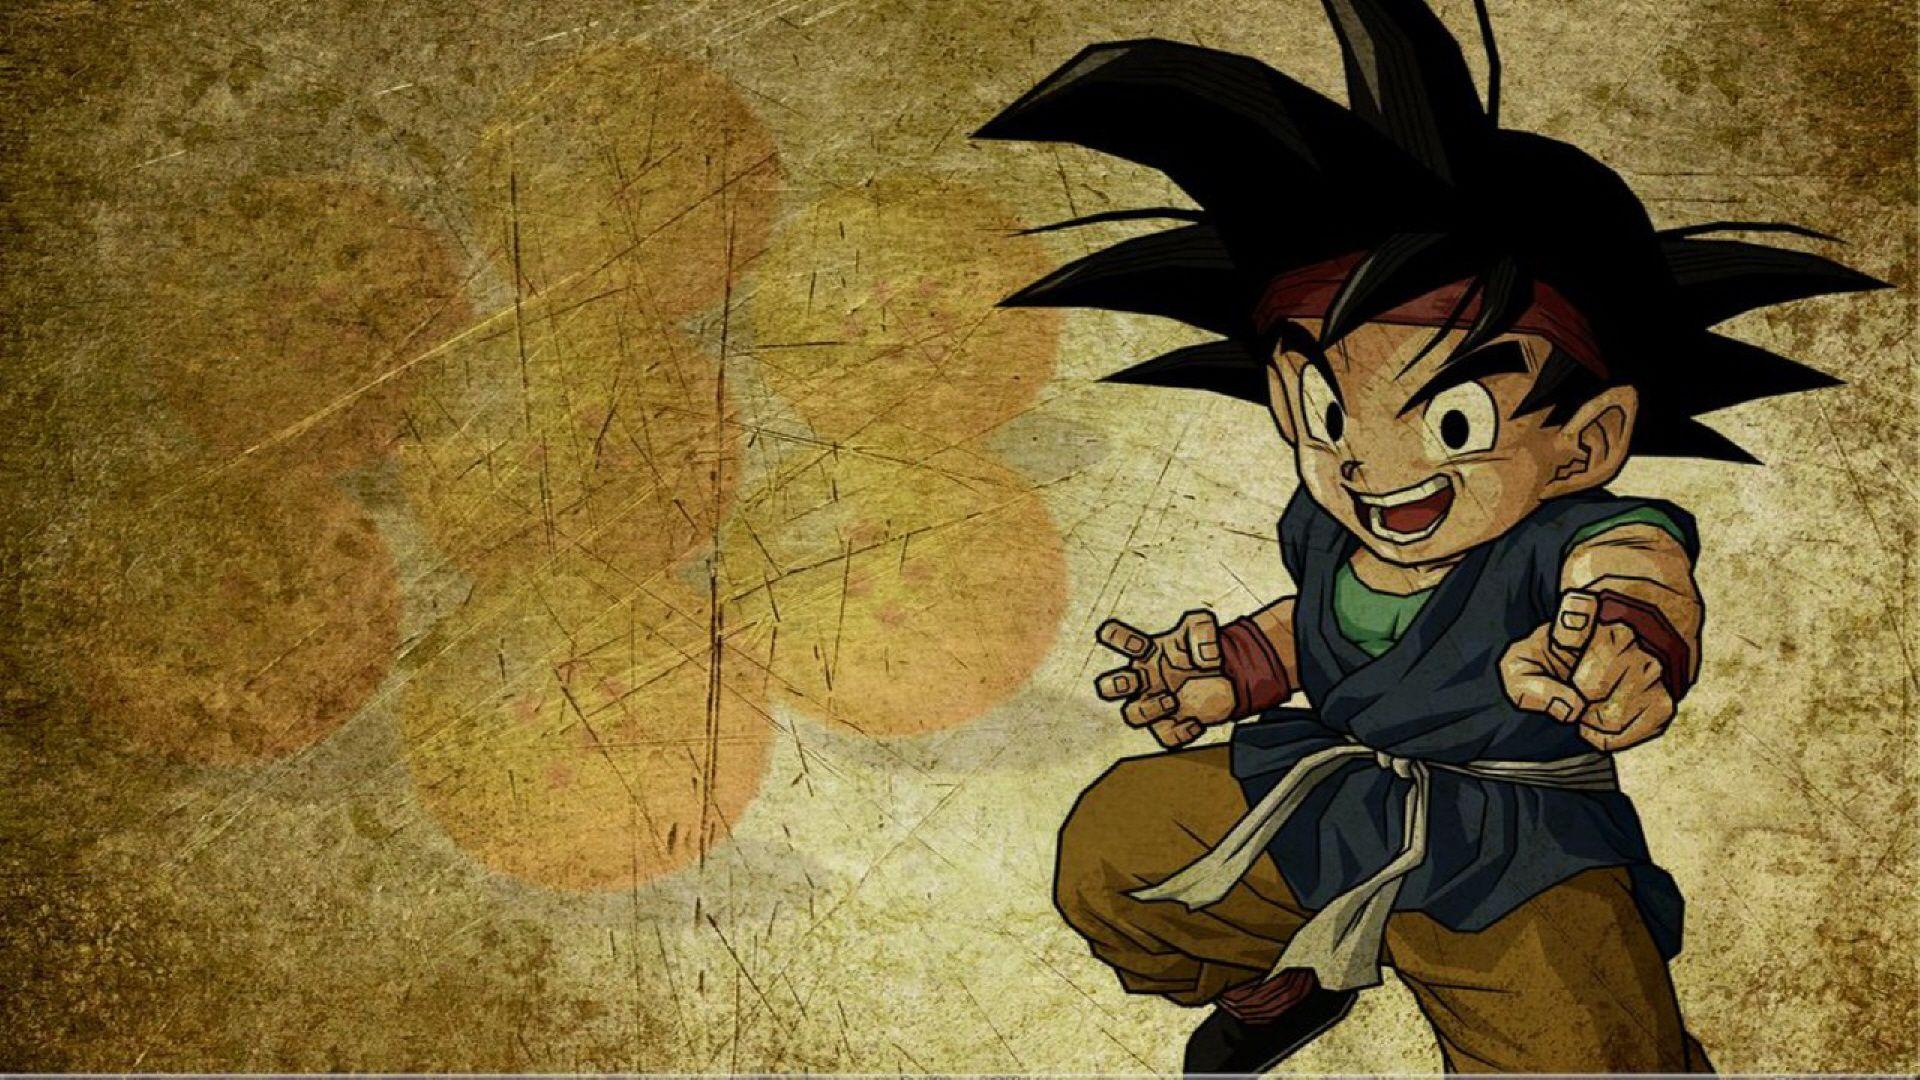 Dragon Ball Z Wallpapers Goku Hd Wallpapers Hd Images Art Photos Goku Wallpaper Anime Wallpaper Z Wallpaper